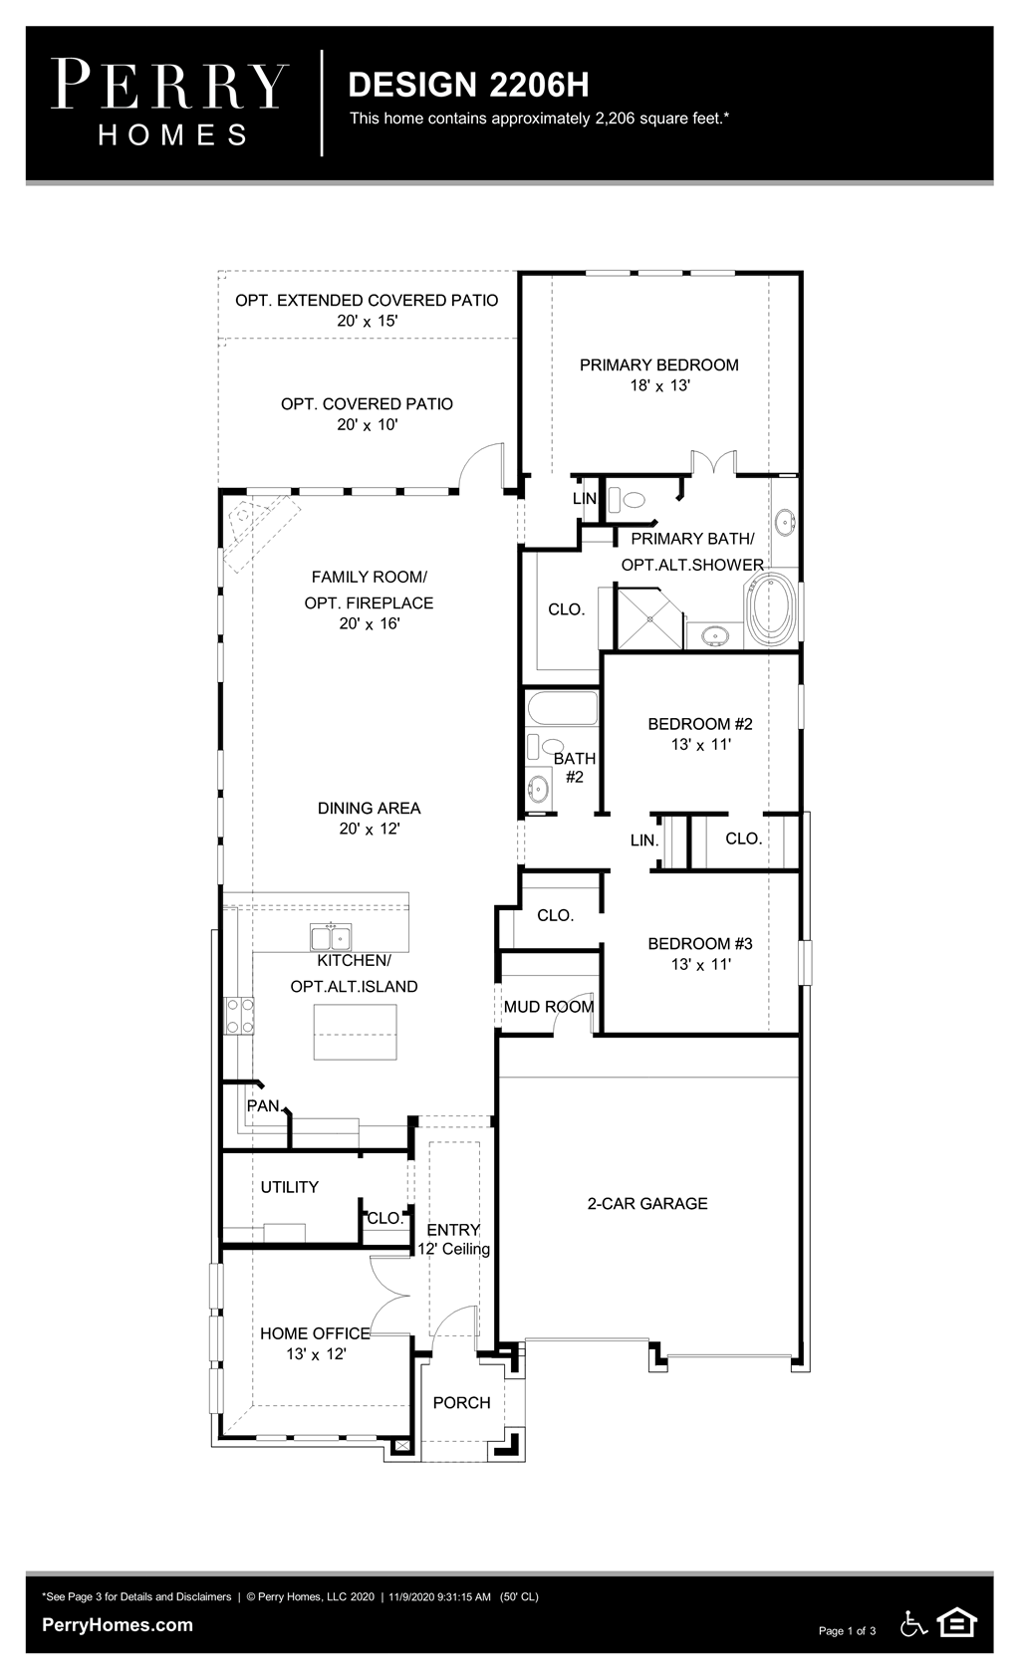 Floor Plan for 2206H